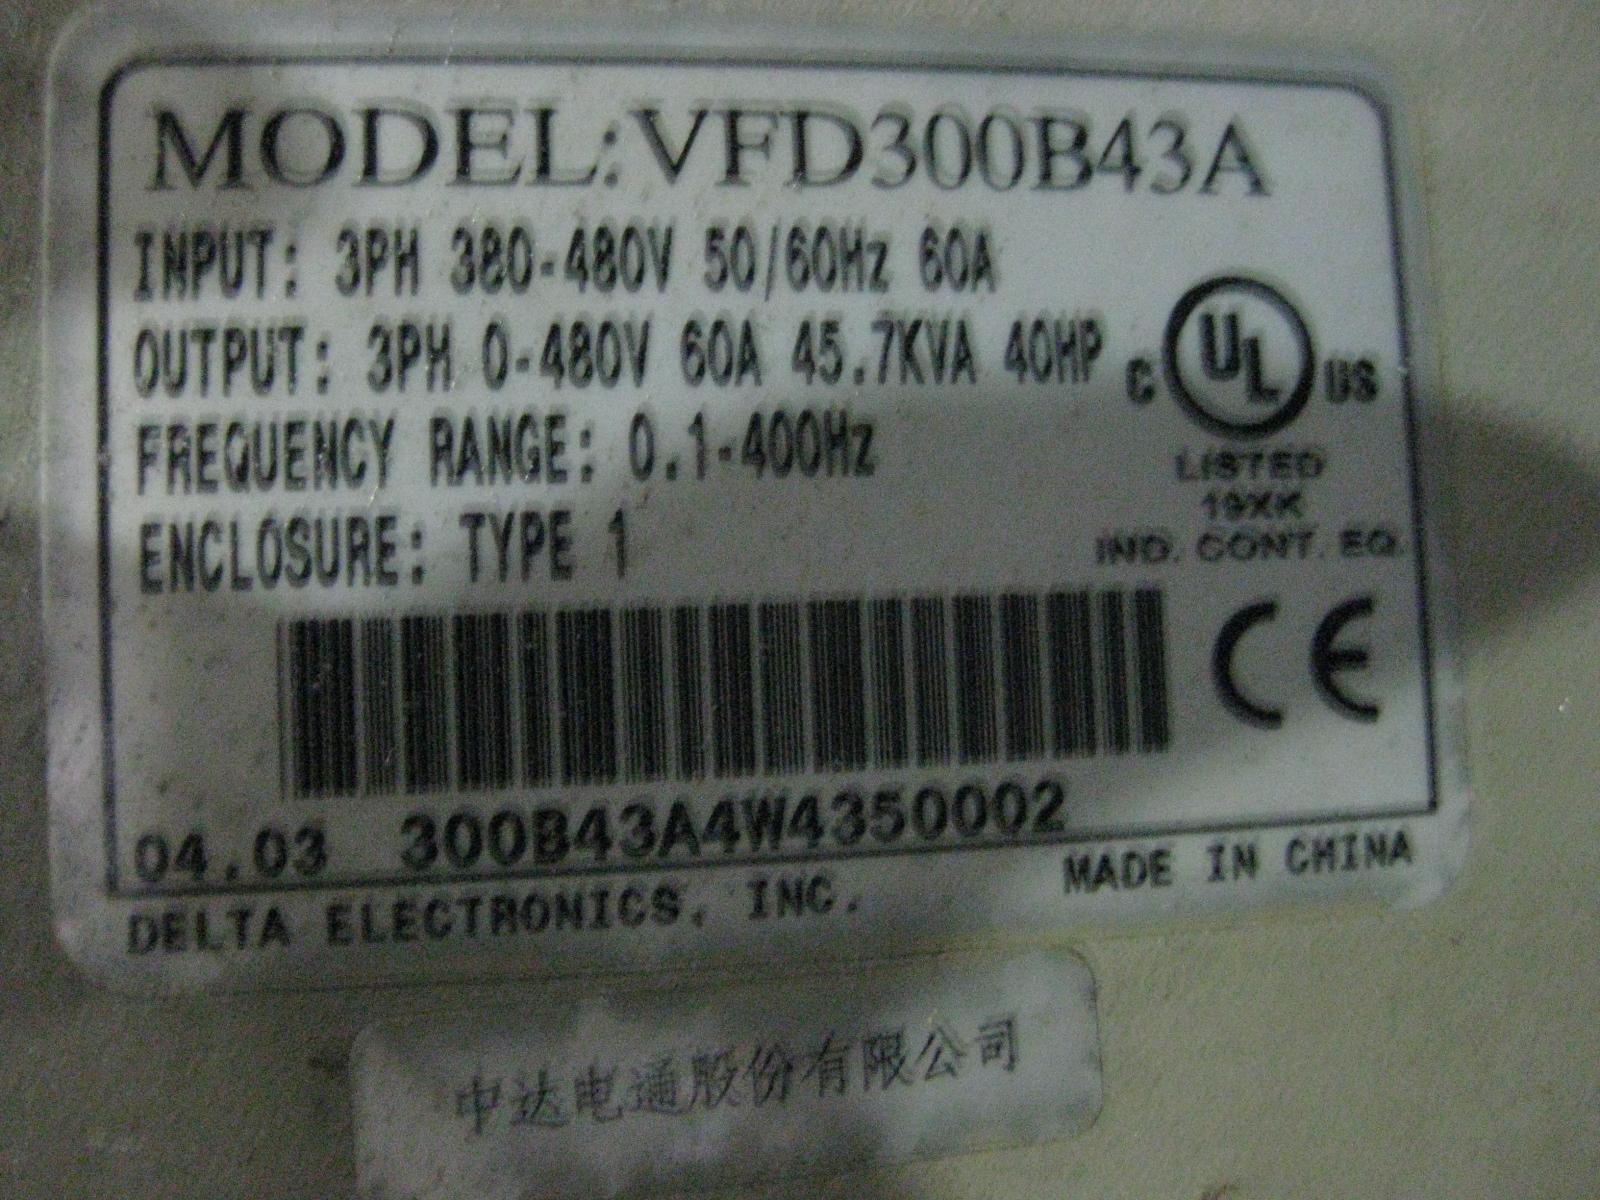 Repair DELTA VFD300B43A INVERTER in Malaysia, Singapore, Thailand, Indonesia